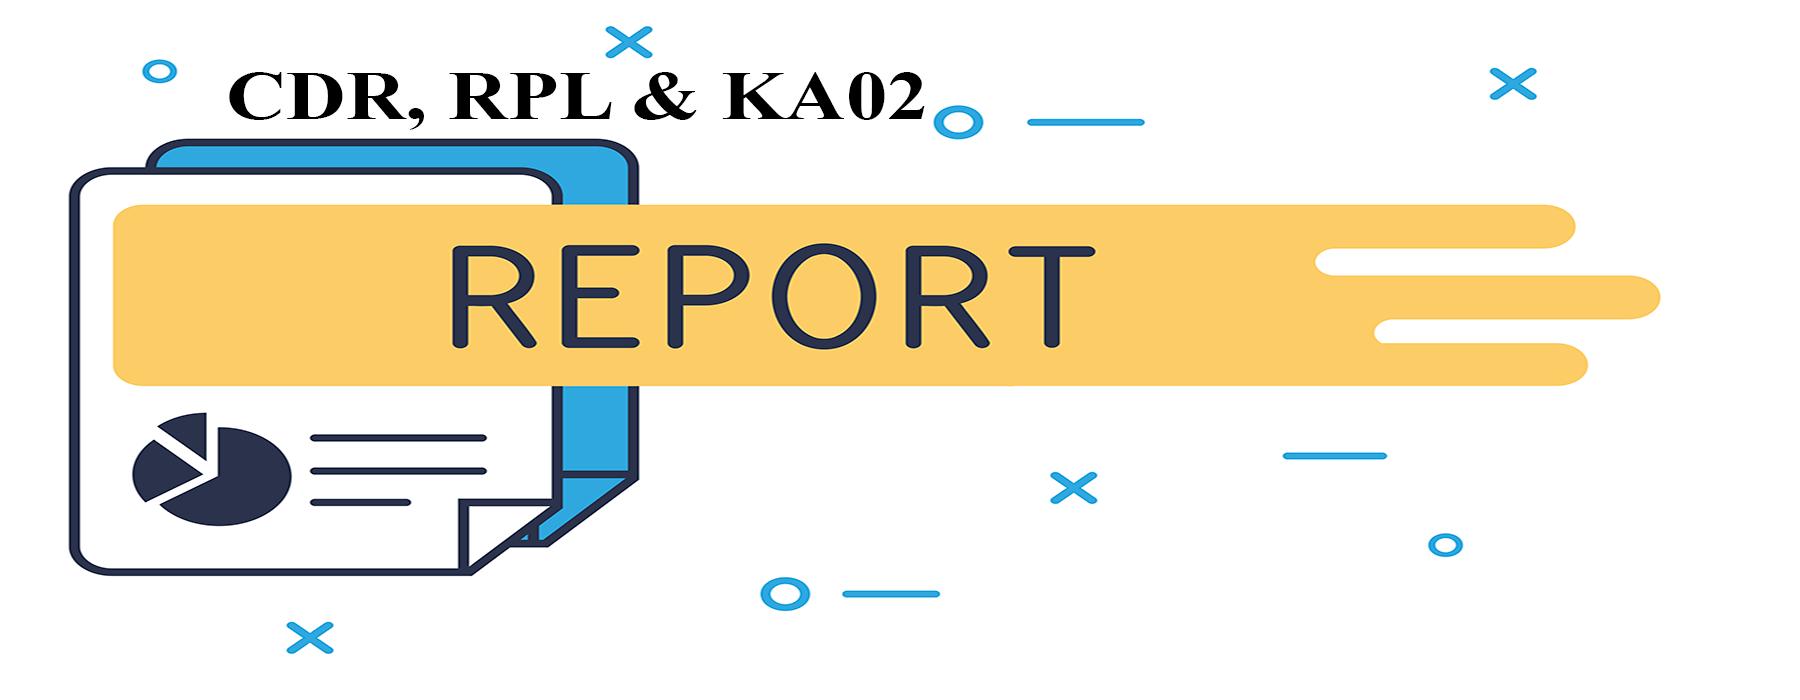 CDR RPL KA02 Report